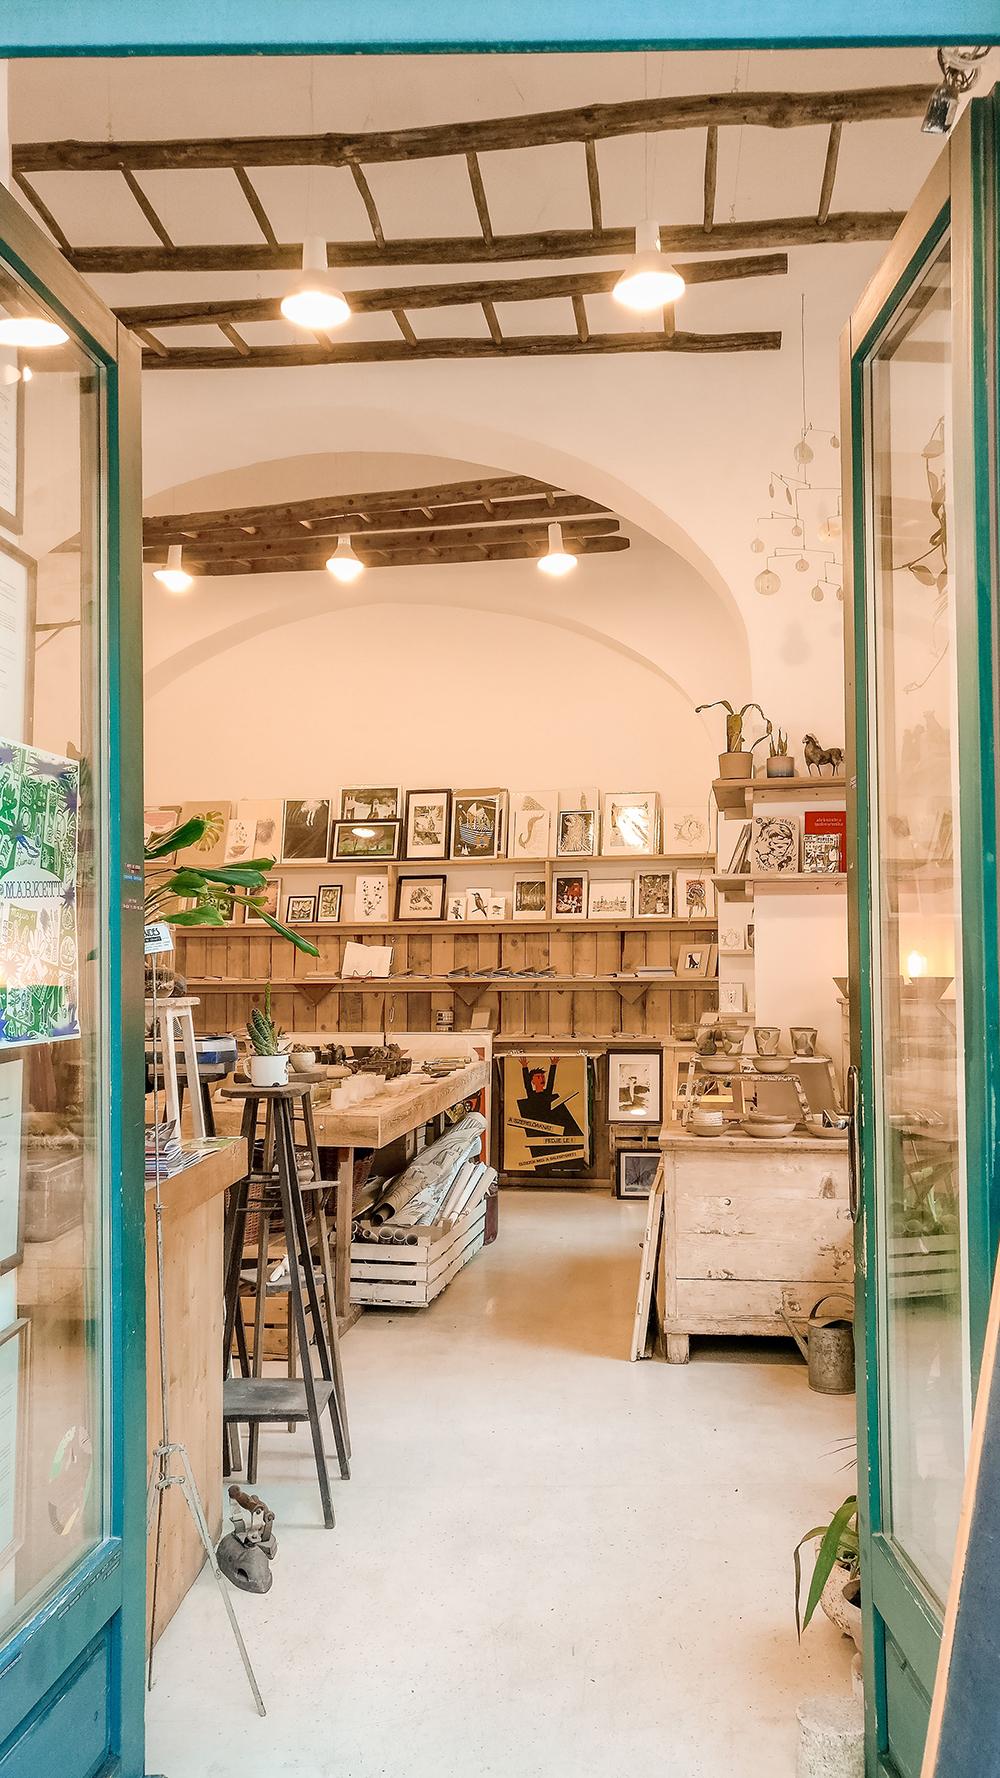 Csendes Concept Store - Budapest design shop guide to best Hungarian souvenirs | Aliz's Wonderland